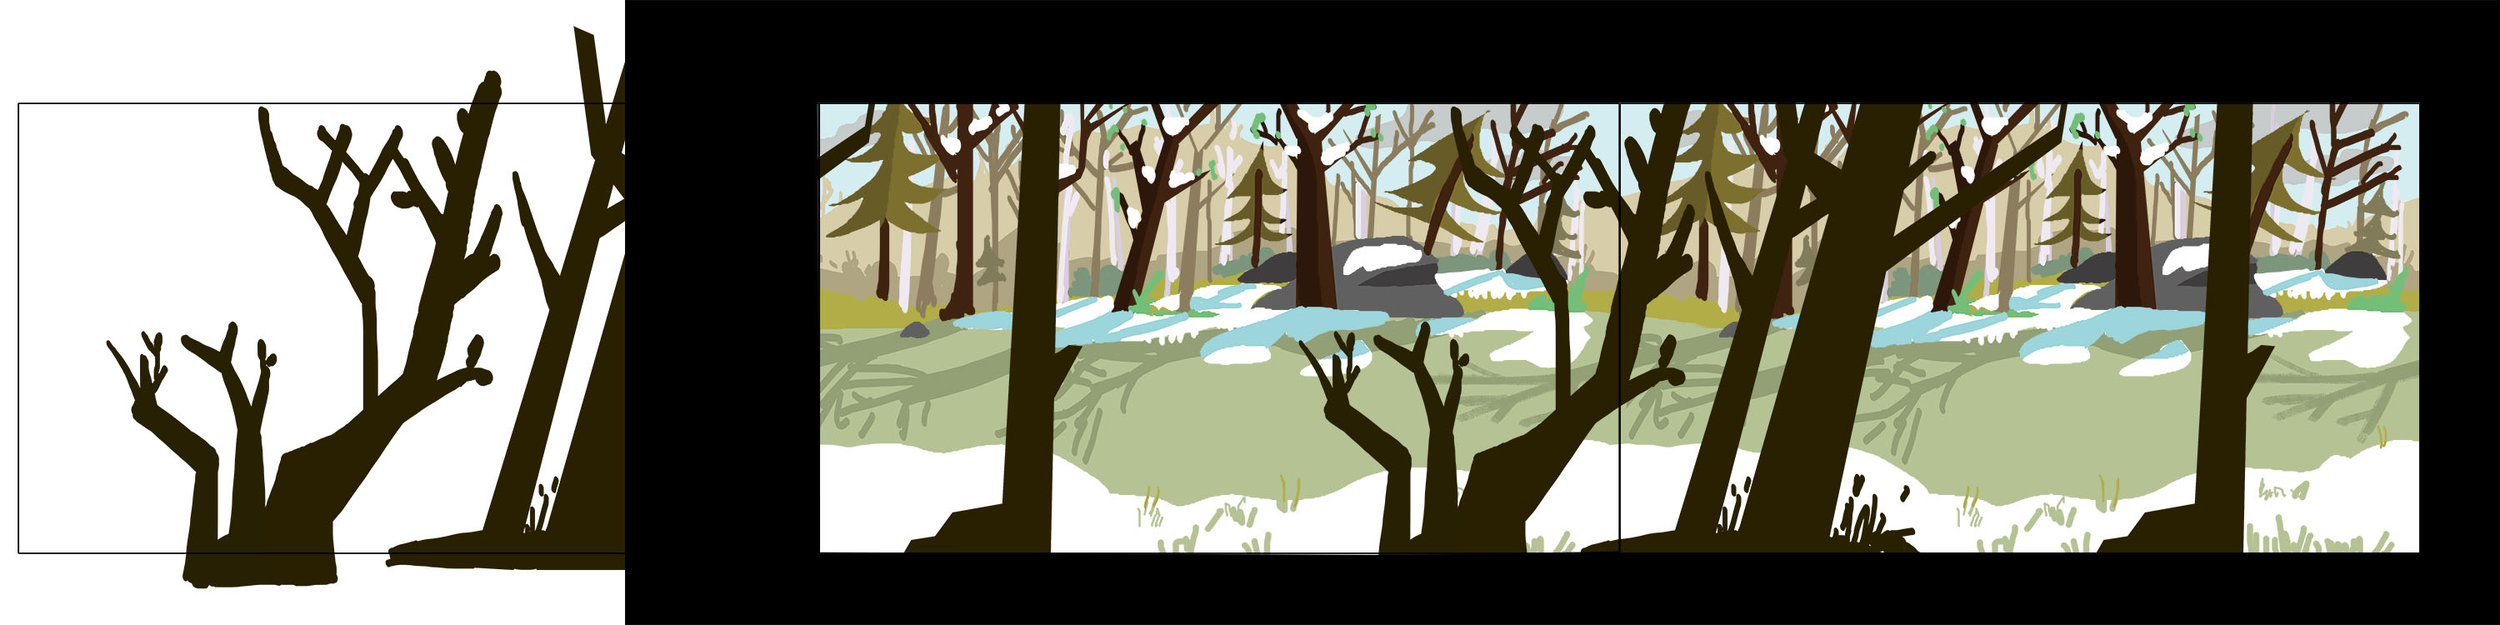 spring_Sc23_forestpan_thumbnail.jpg